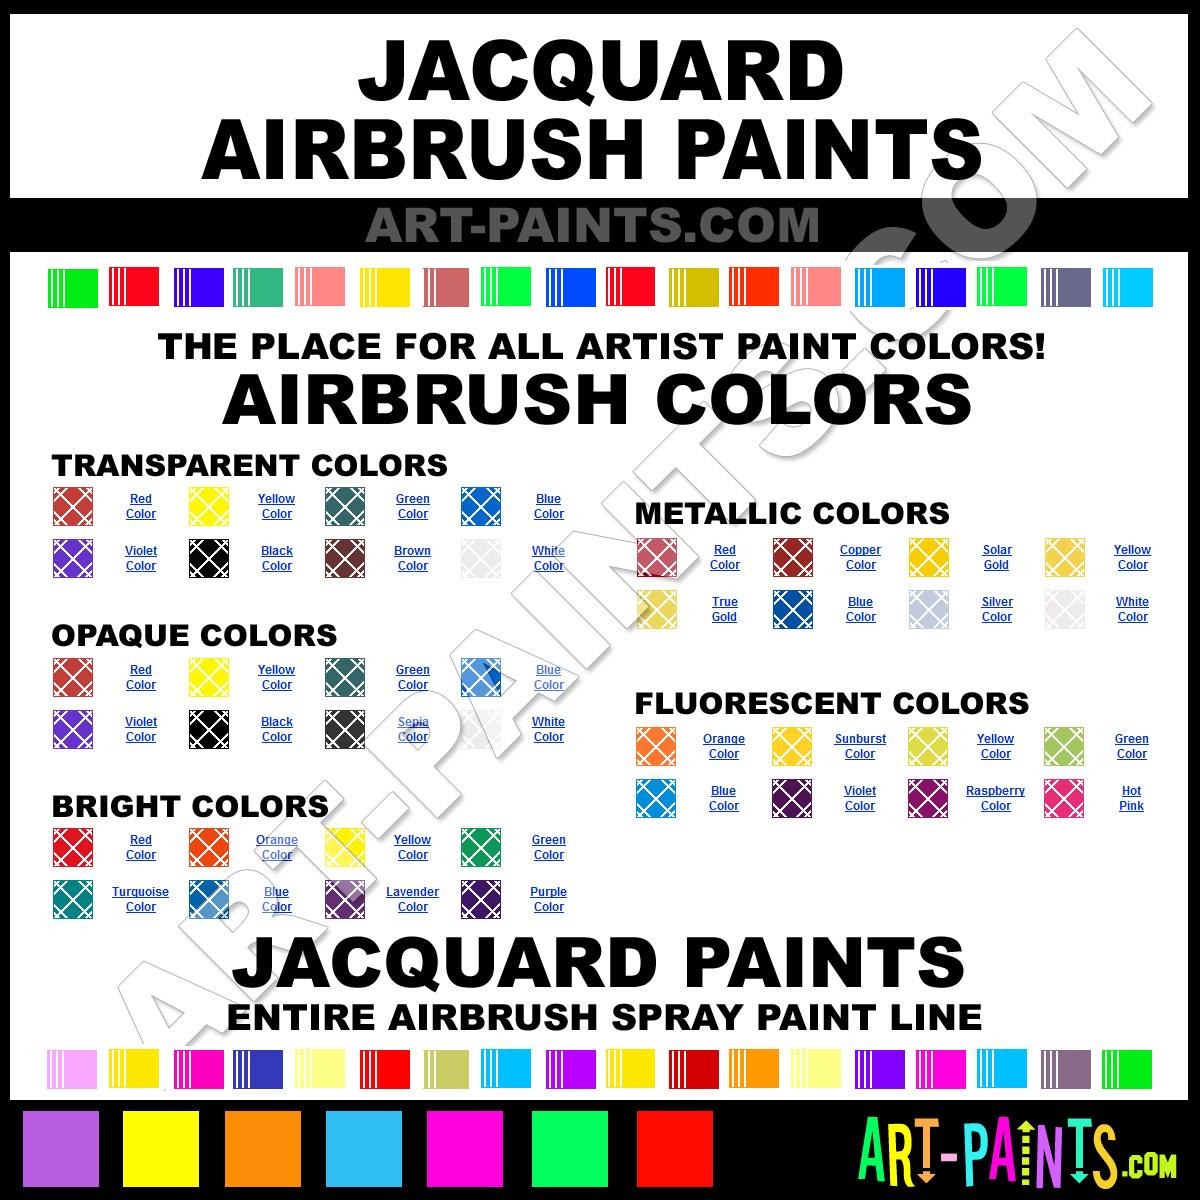 Jacquard Airbrush Spray Paint Brands Jacquard Spray Paint Brands Airbrush Spray Paints